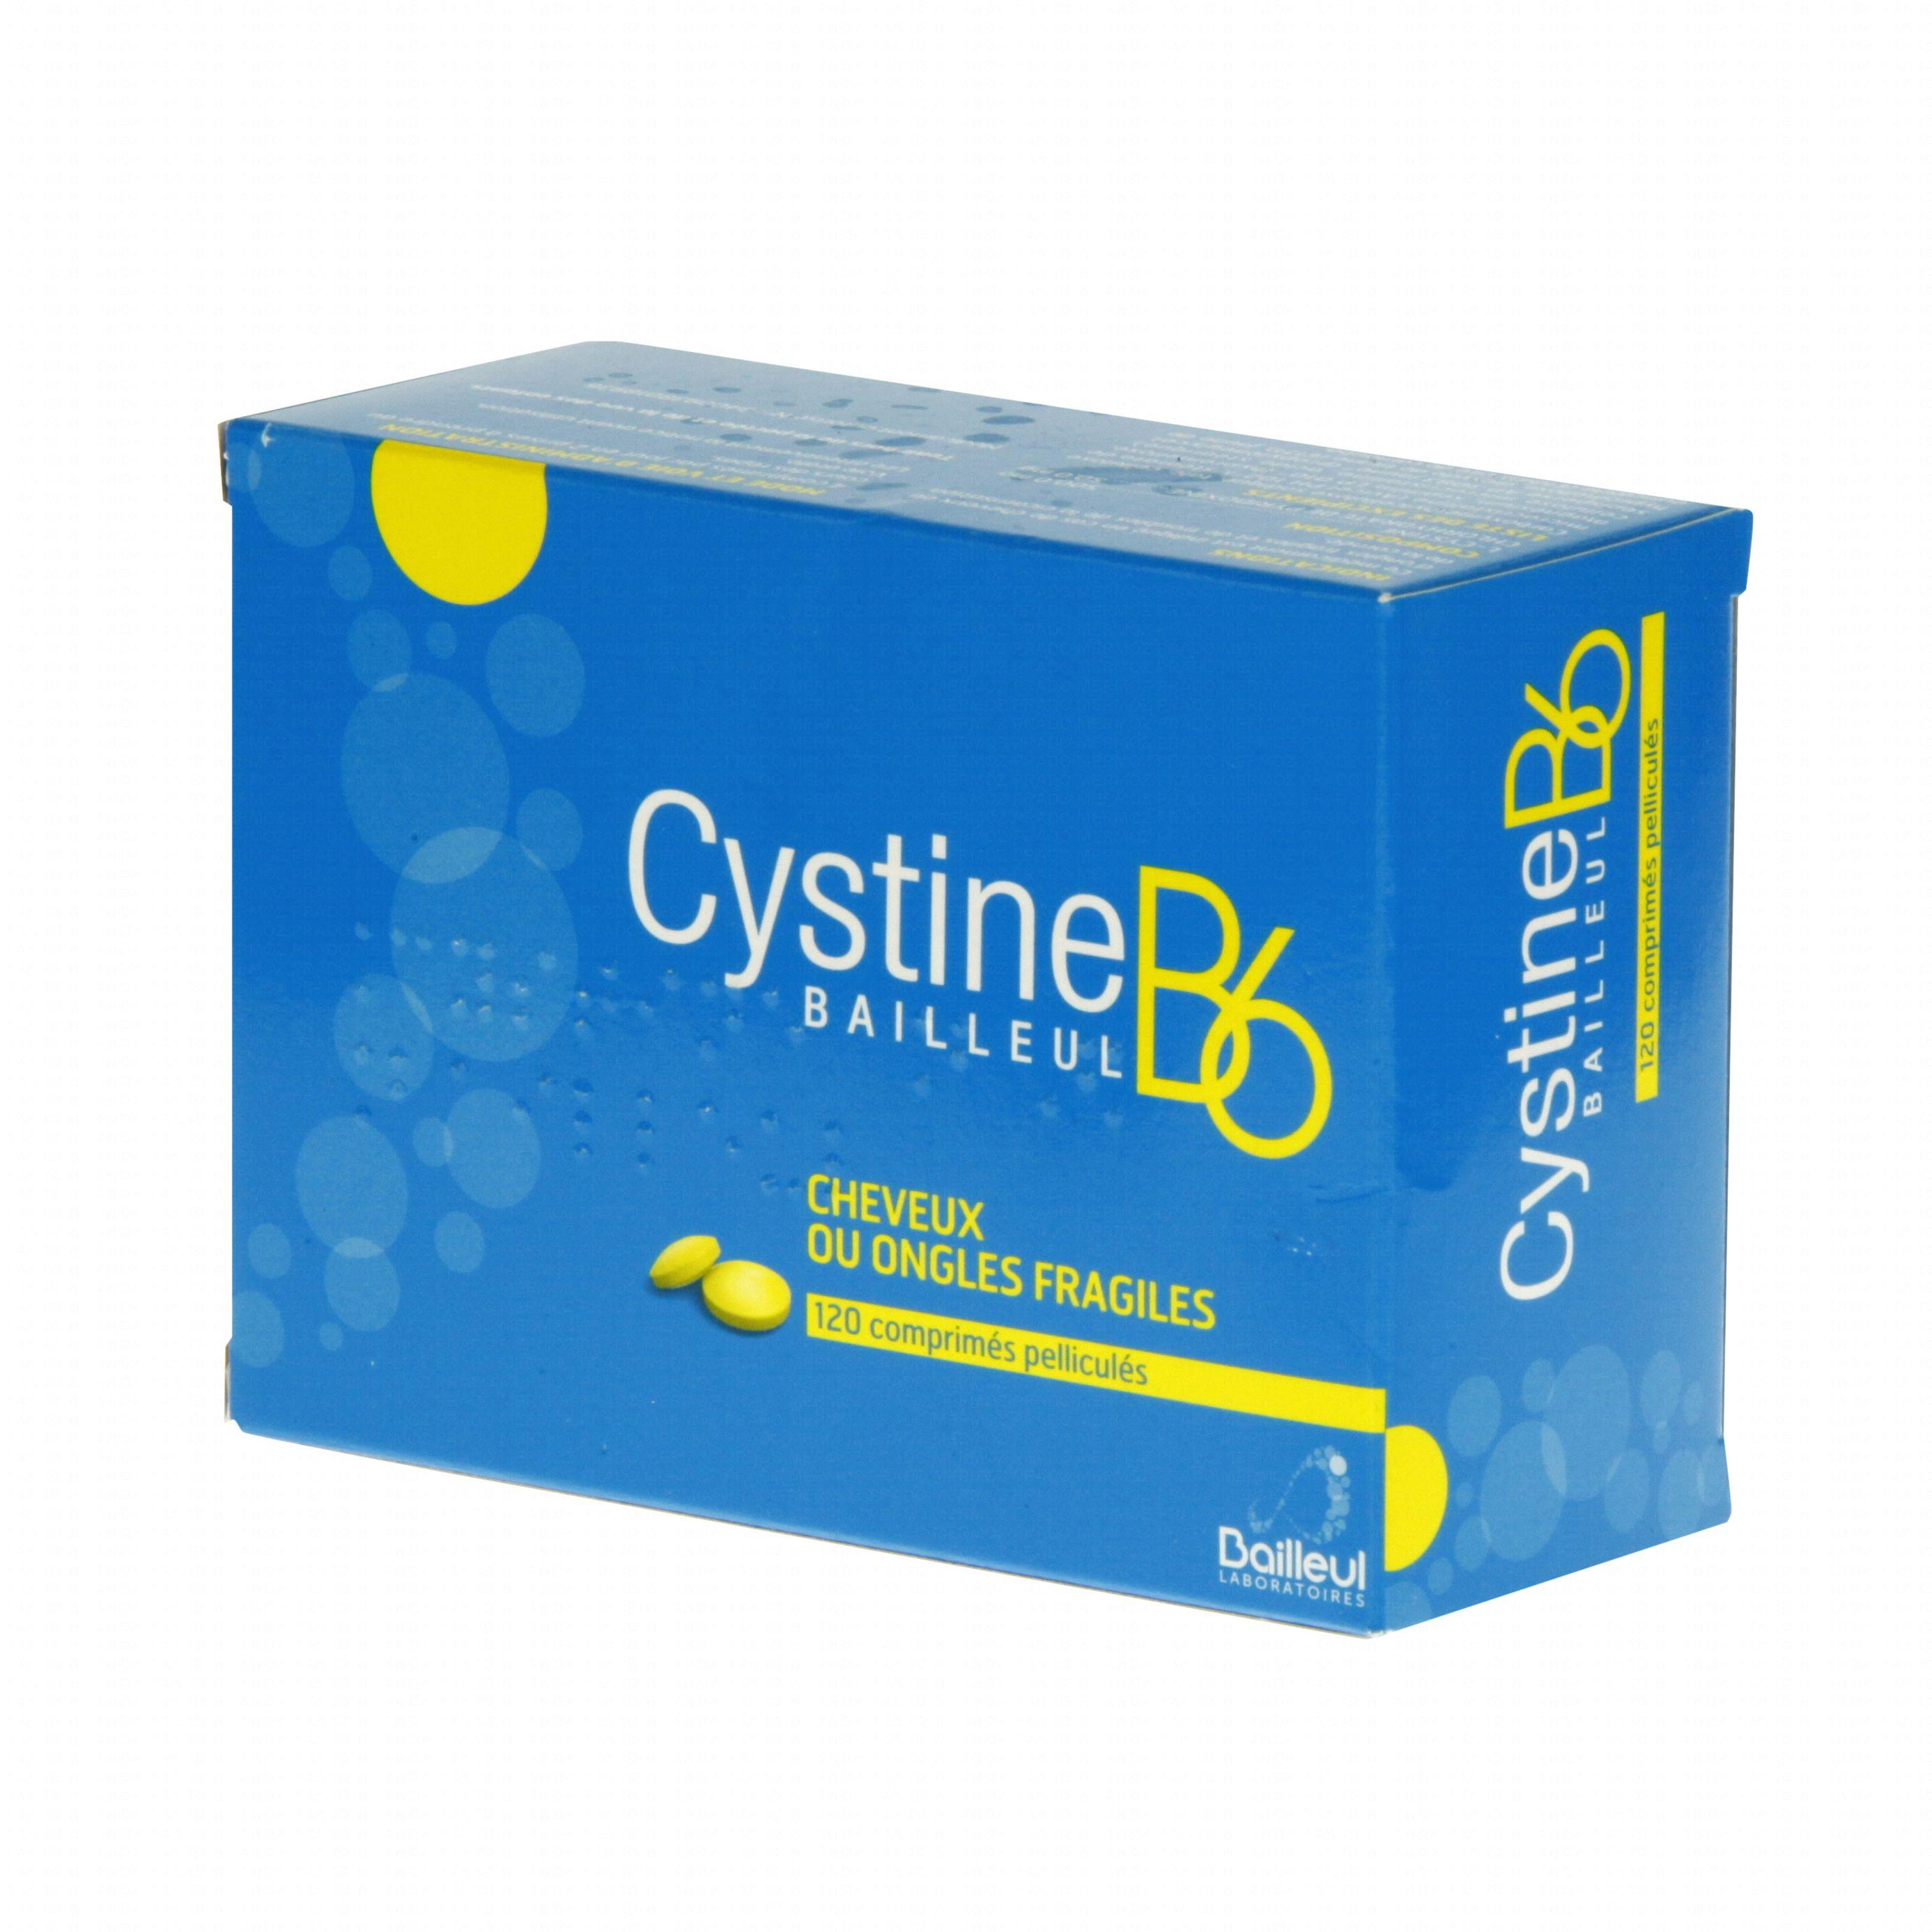 Cystine b6 boîte de 120 comprimés Bailleul (médicament